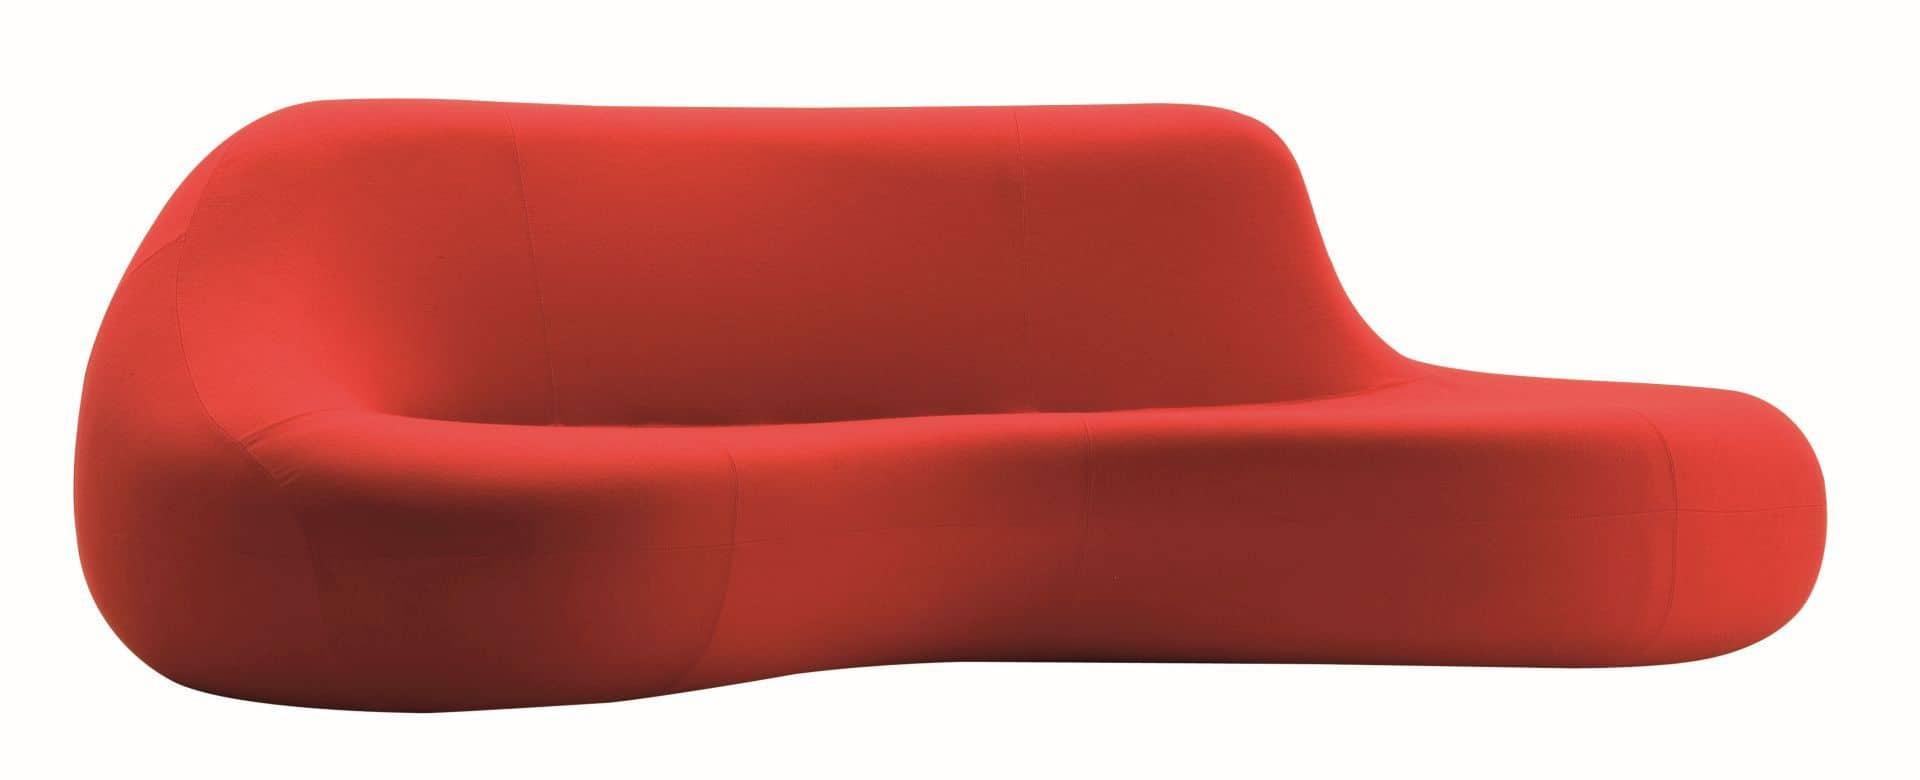 Sofa Koochy dla Zanotta; projekt Karim Rashid